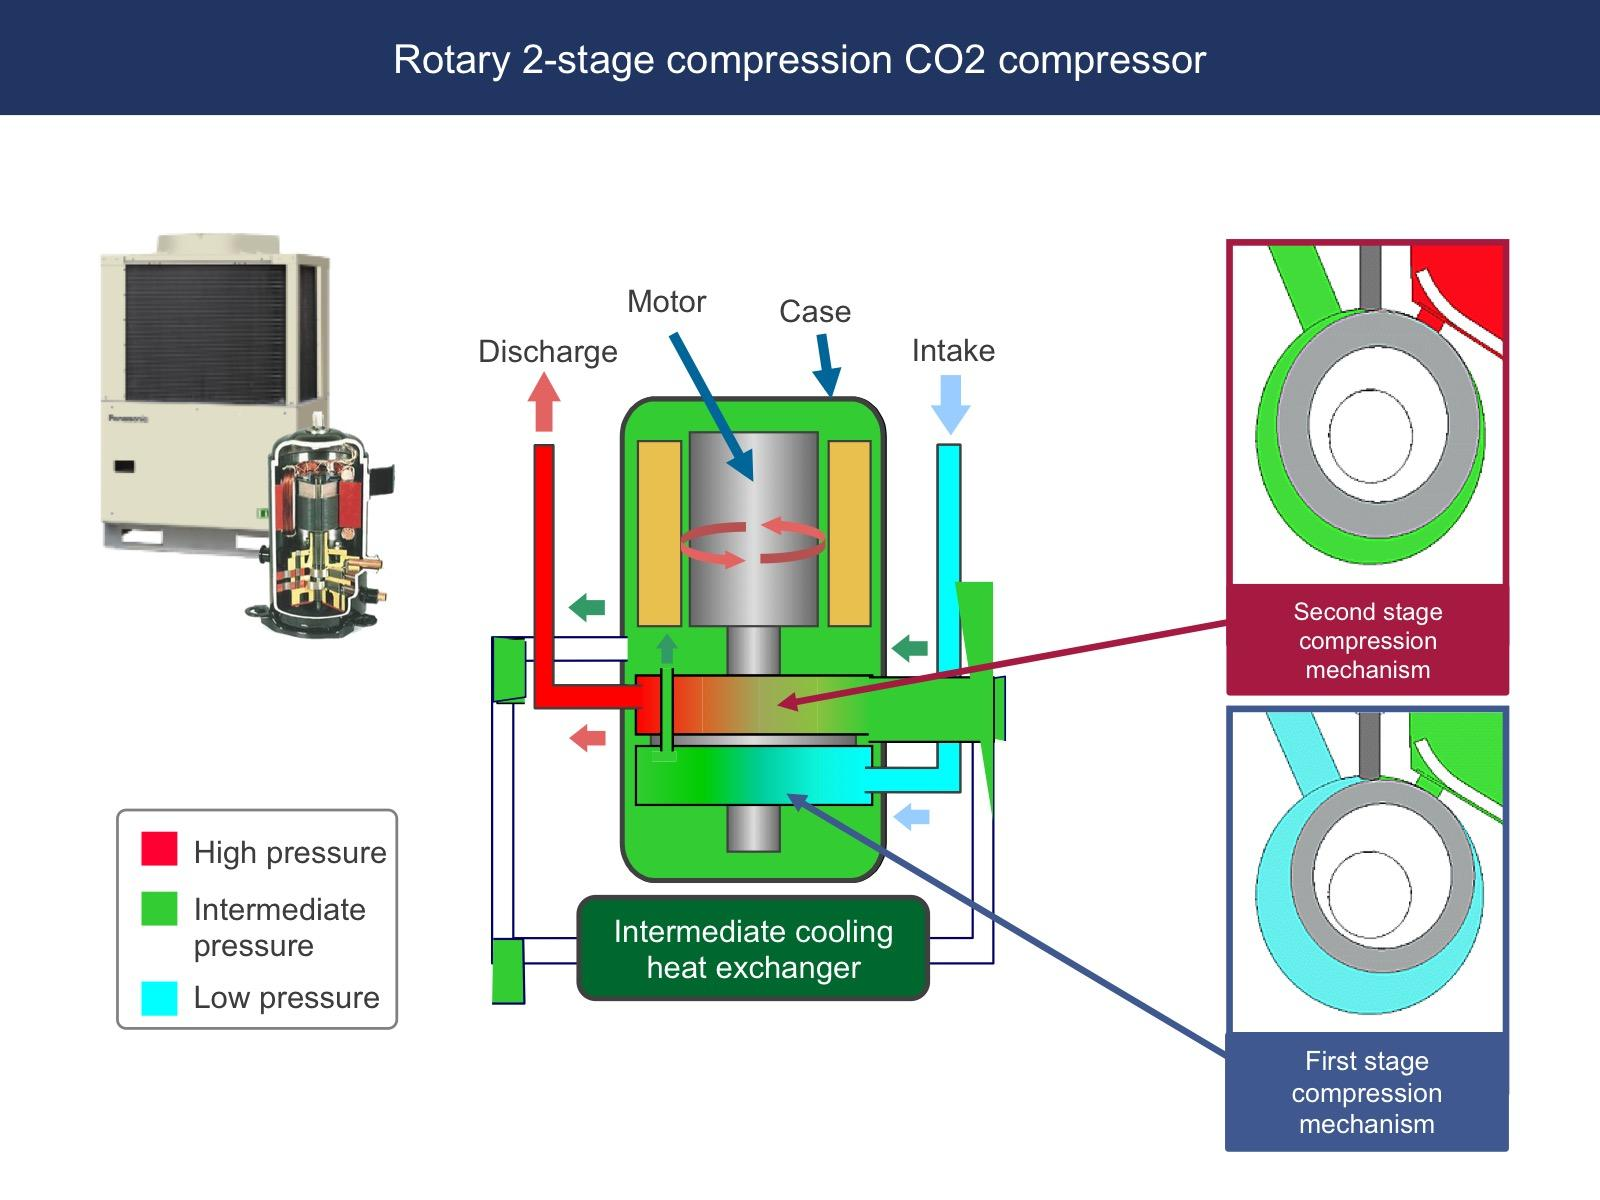 image: panasonic's rotary 2-stage compression CO2 compressor